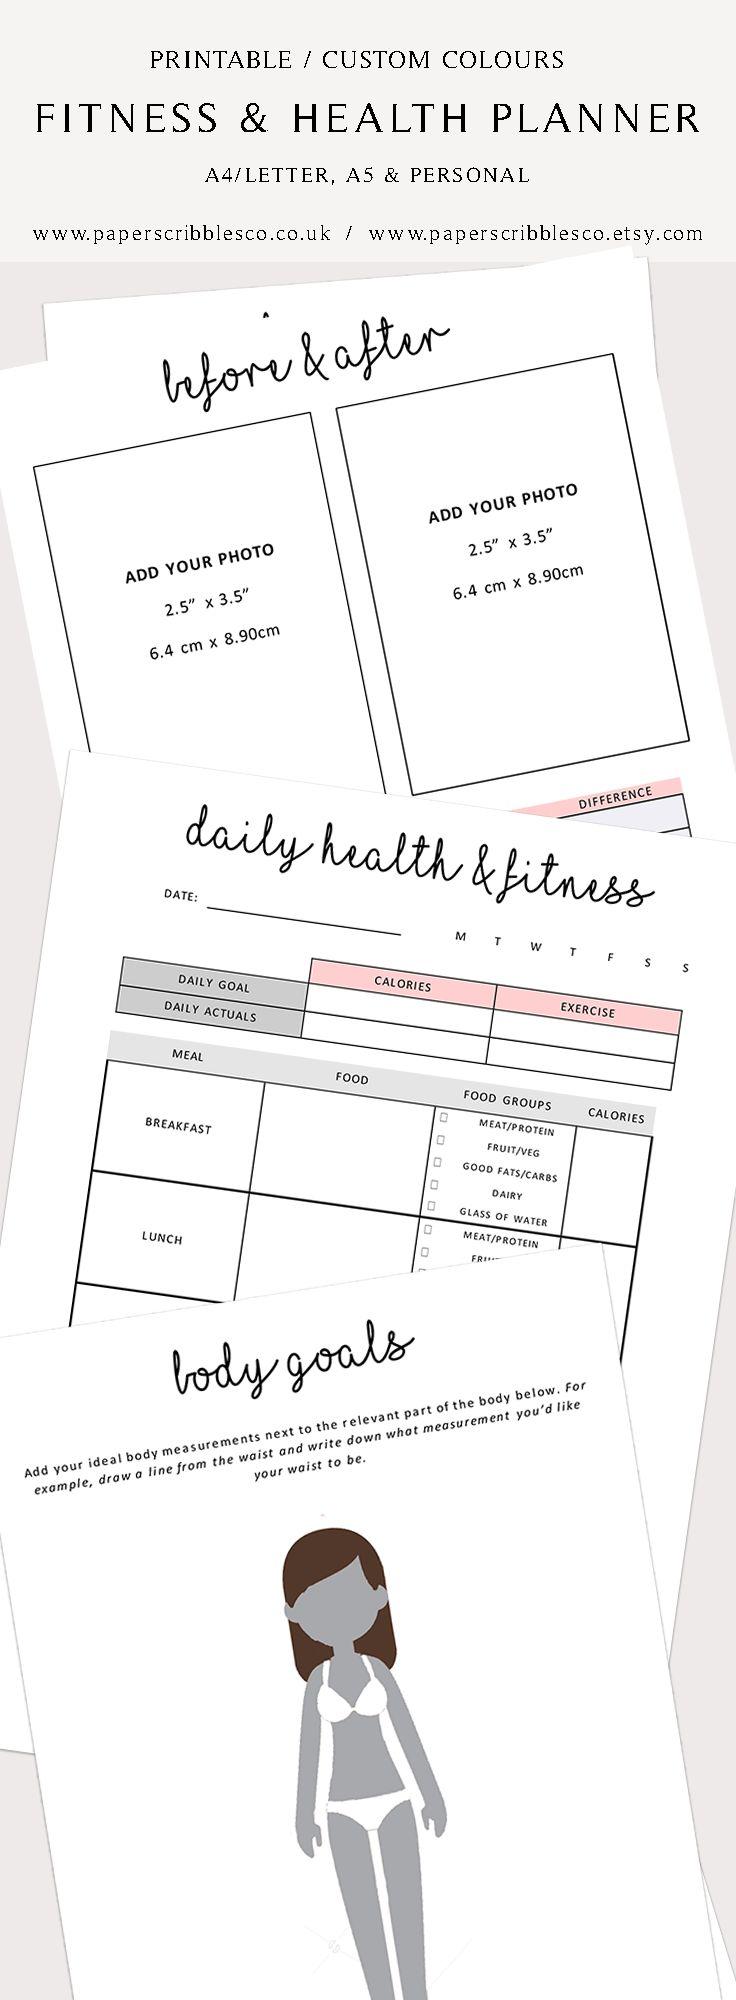 Fitness & Health | Fitness Planner | Health Planner | Weight Loss Planner | Printable Planner | Planner Inserts | Fitness Planner Printable | Fitness Motivation | Fitness Tracker | Weight Planner | Body Goals | Fitness Goals